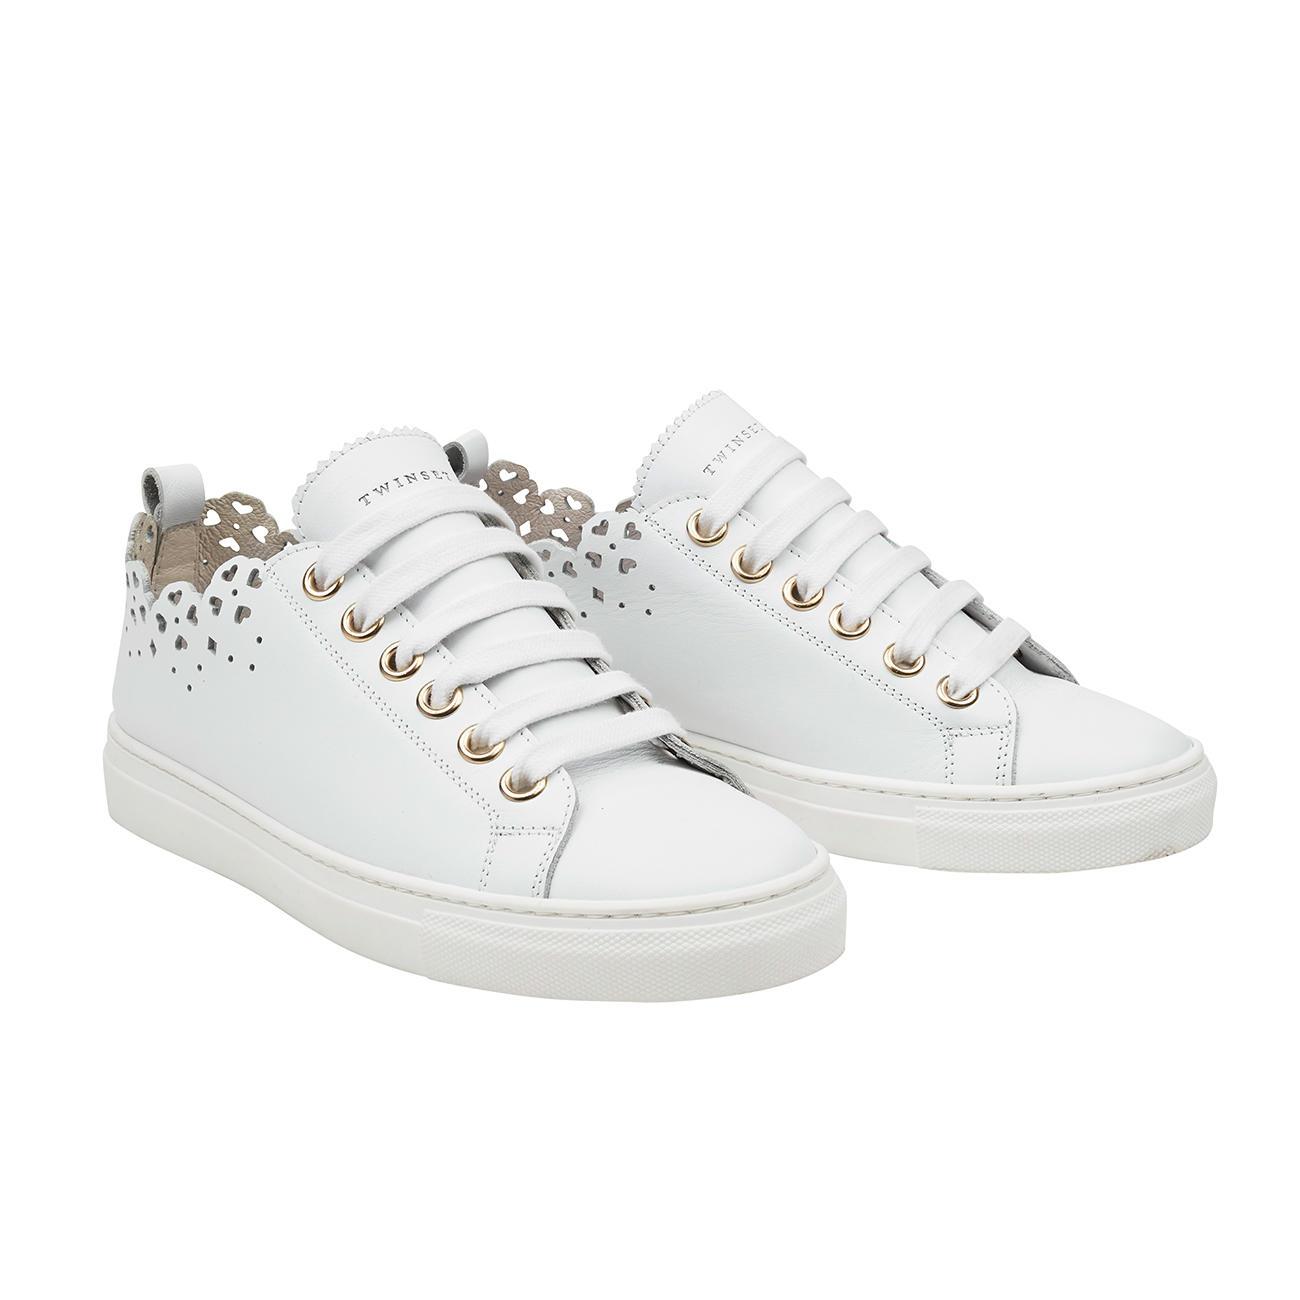 new concept 52b77 6b329 TWINSET Spitzen-Sneaker | Mode-Klassiker entdecken